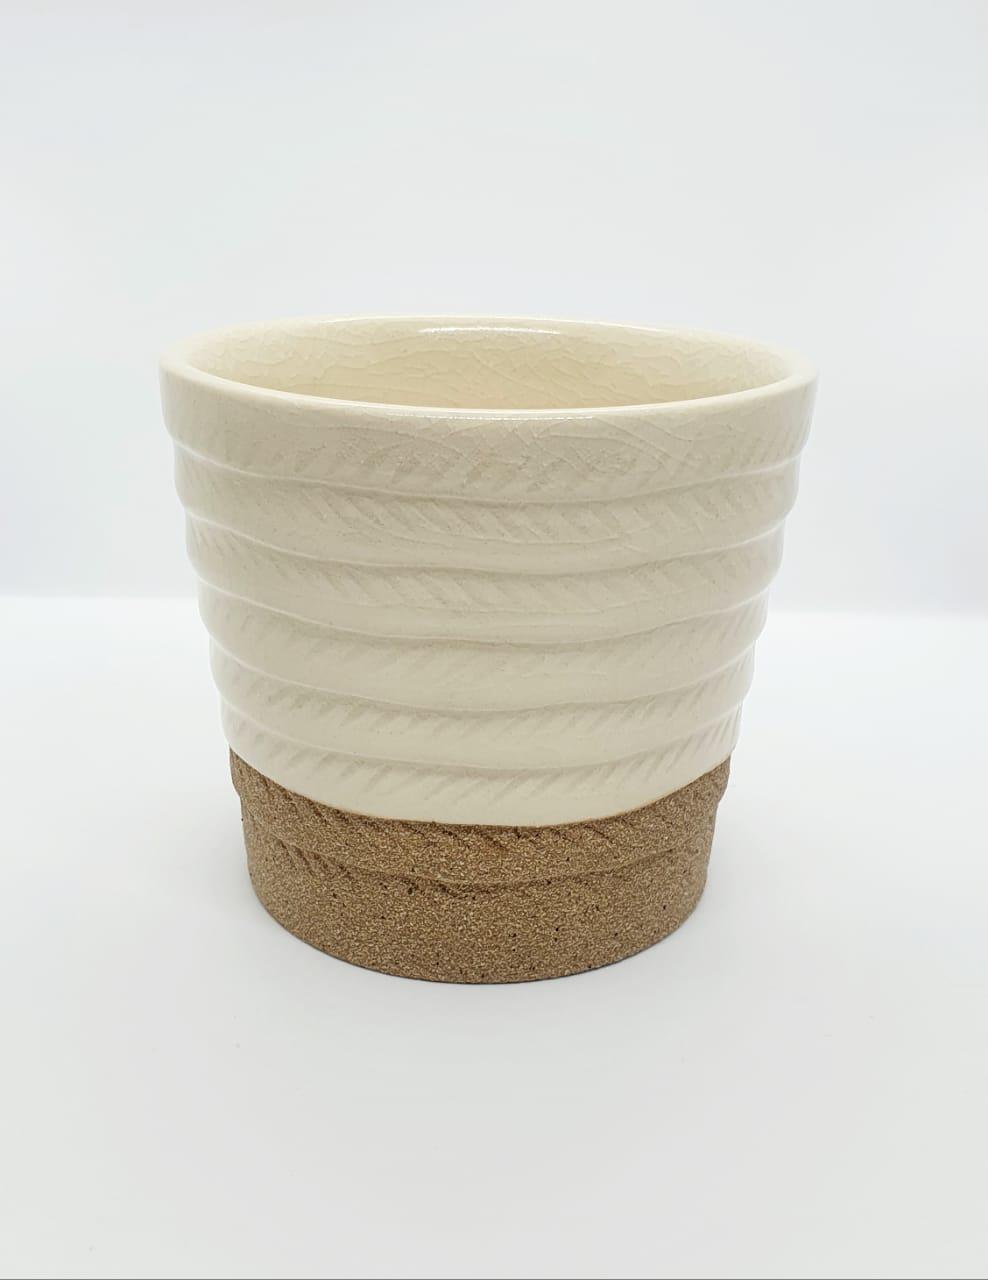 Vaso decorativo de cerâmica degraus areia bege